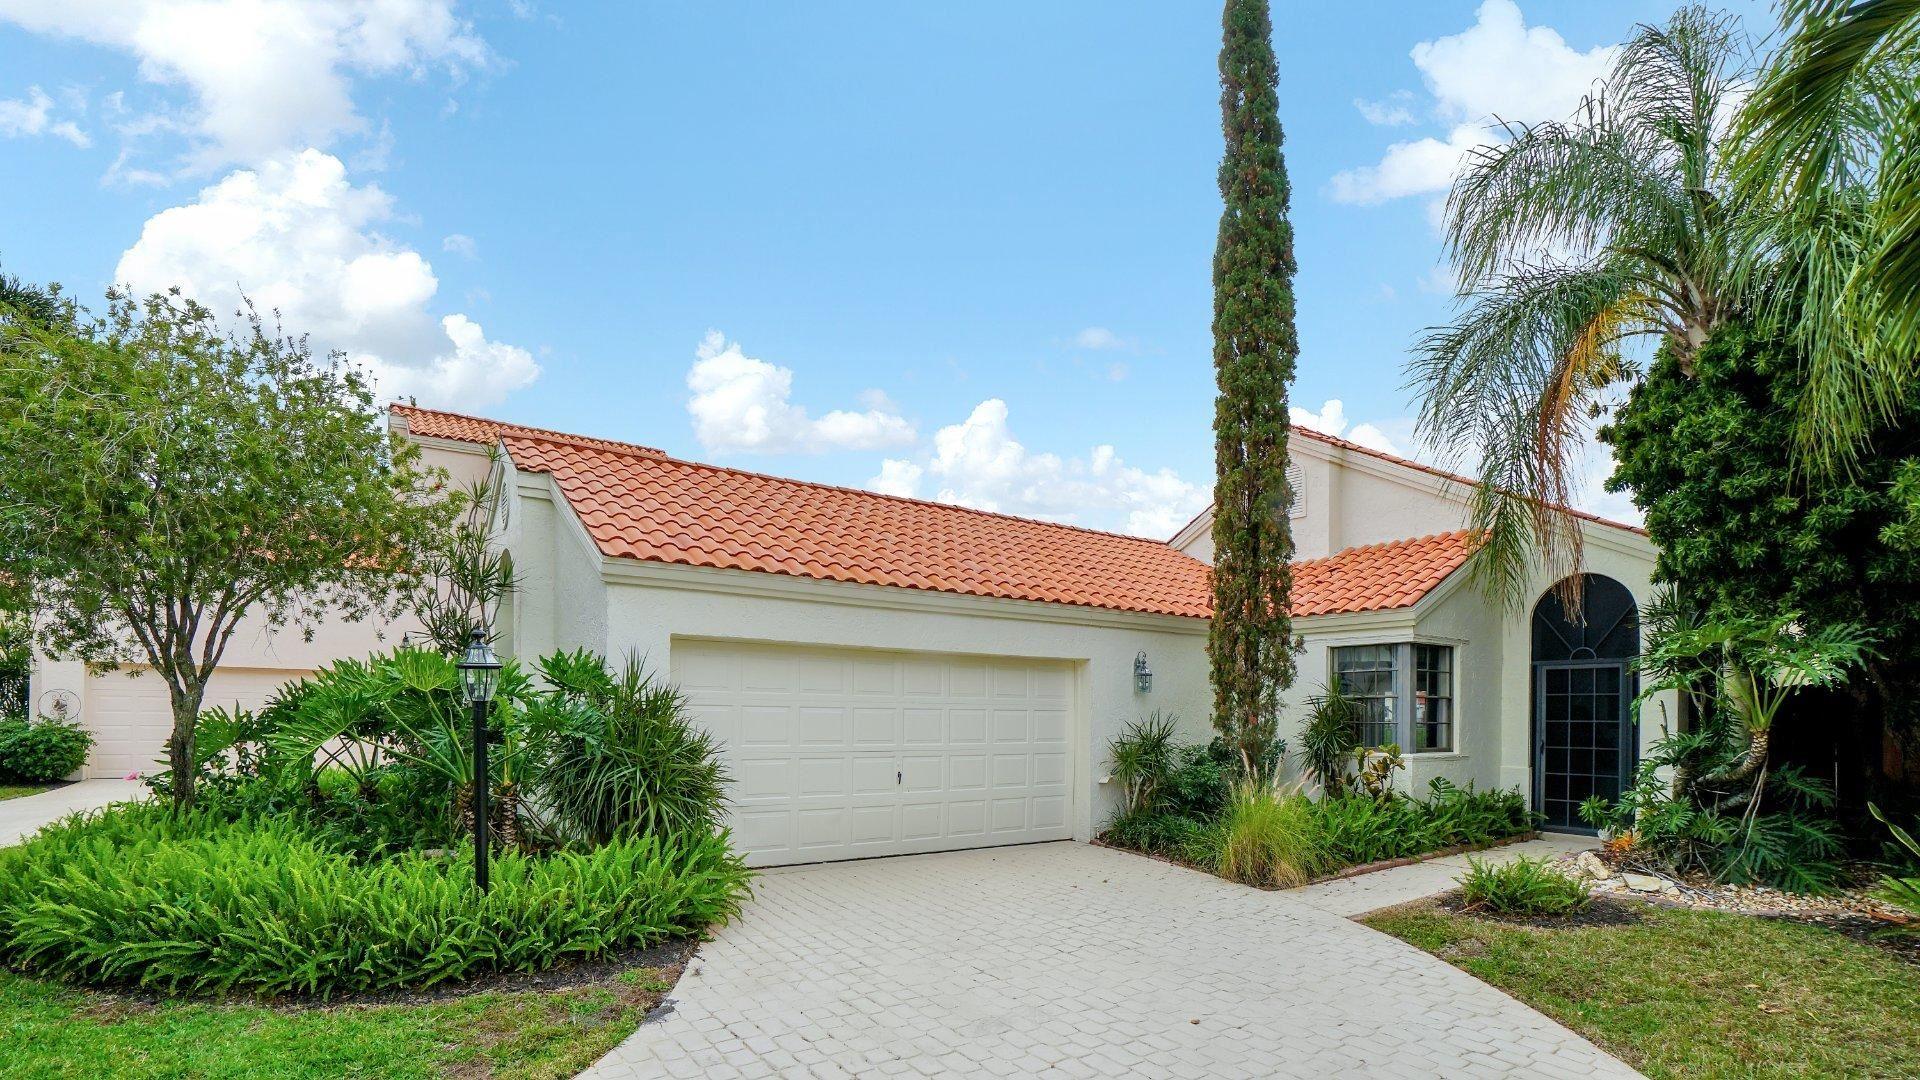 Photo of 13306 Saint Tropez Circle, Palm Beach Gardens, FL 33410 (MLS # RX-10698879)